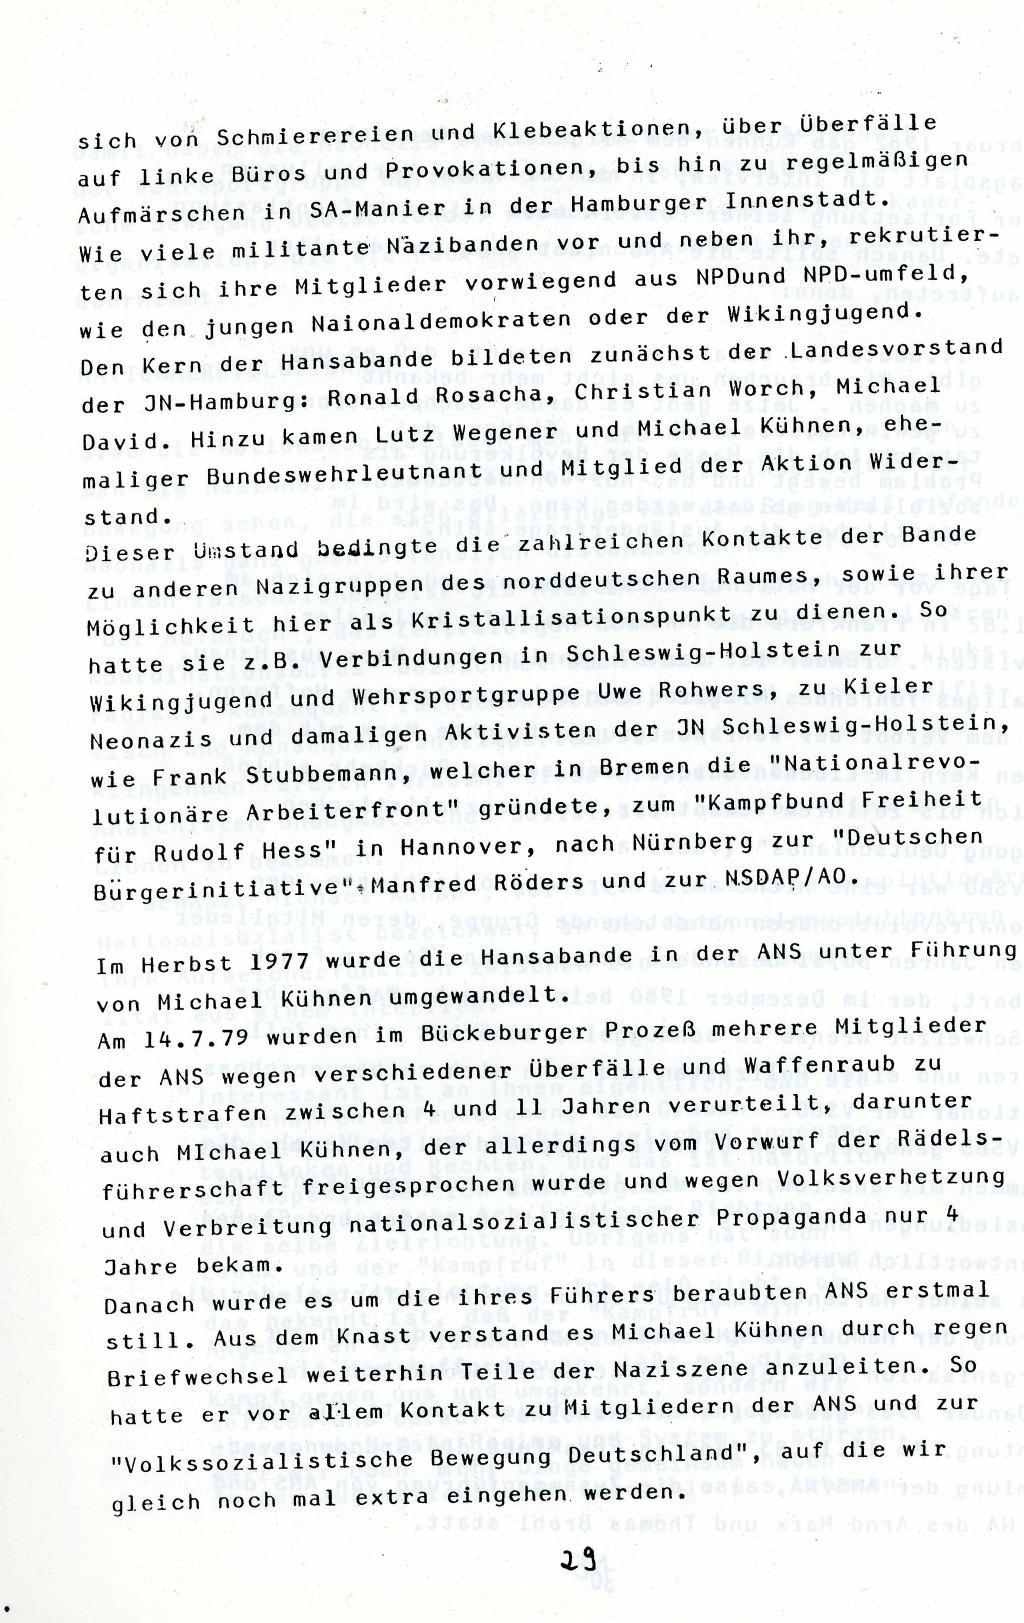 Berlin_1983_Autonome_Gruppen_Faschismus_im_Kapitalismus_29